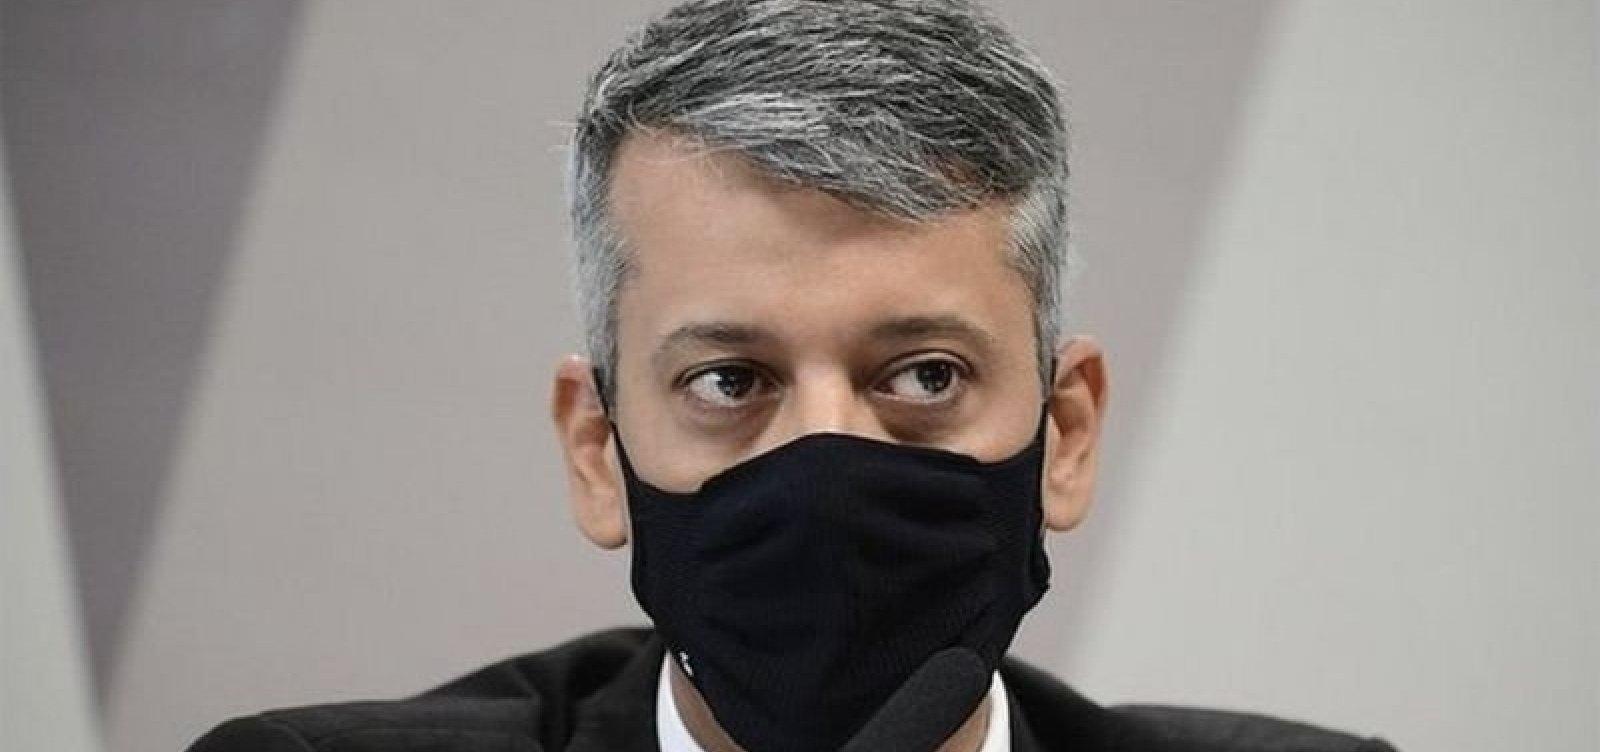 Procuradoria abre inquérito civil para investigar suspeita de pedido de propina em vacinas por Roberto Dias